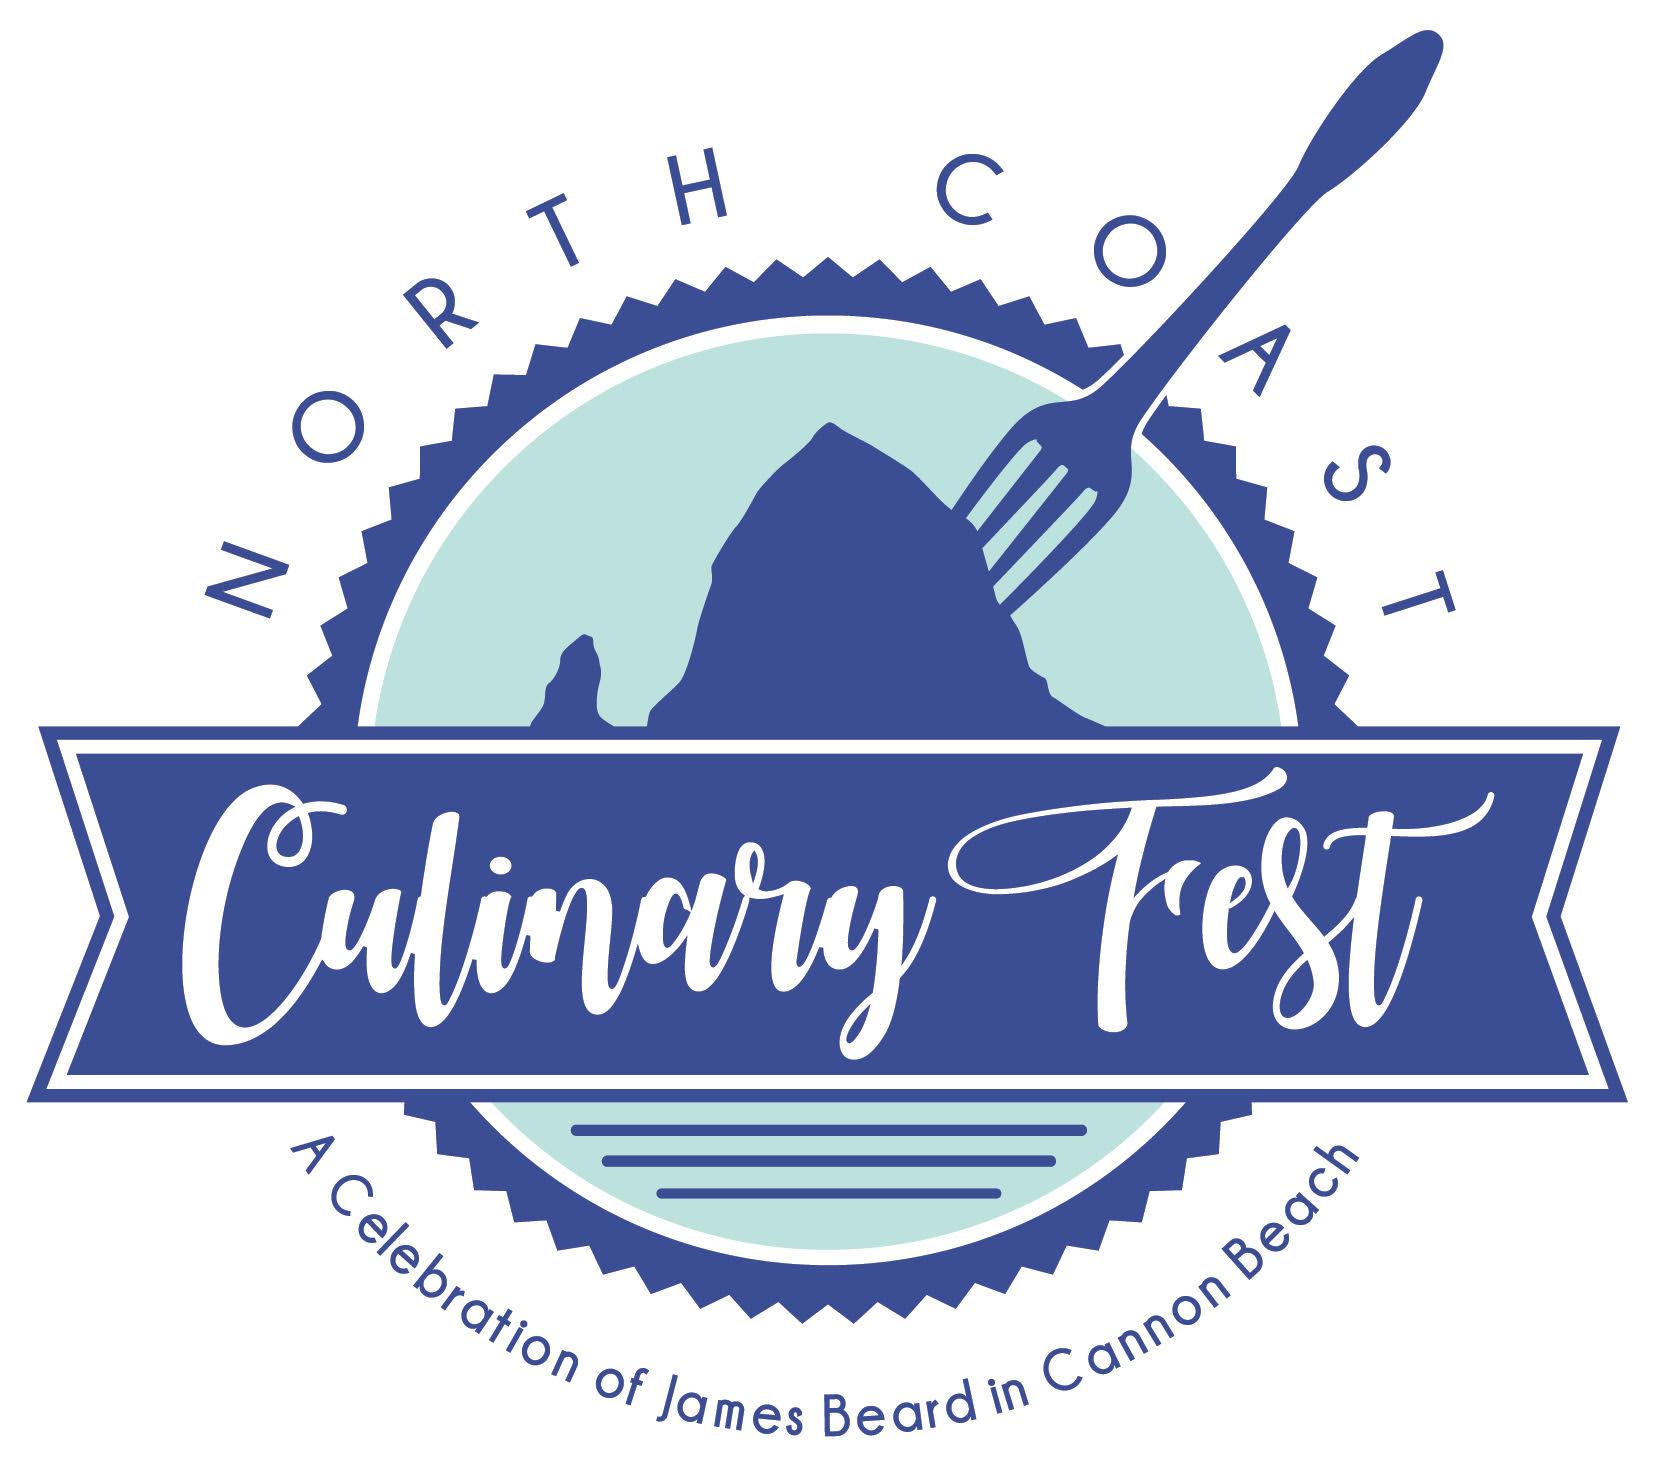 North Coast Culinary Fest